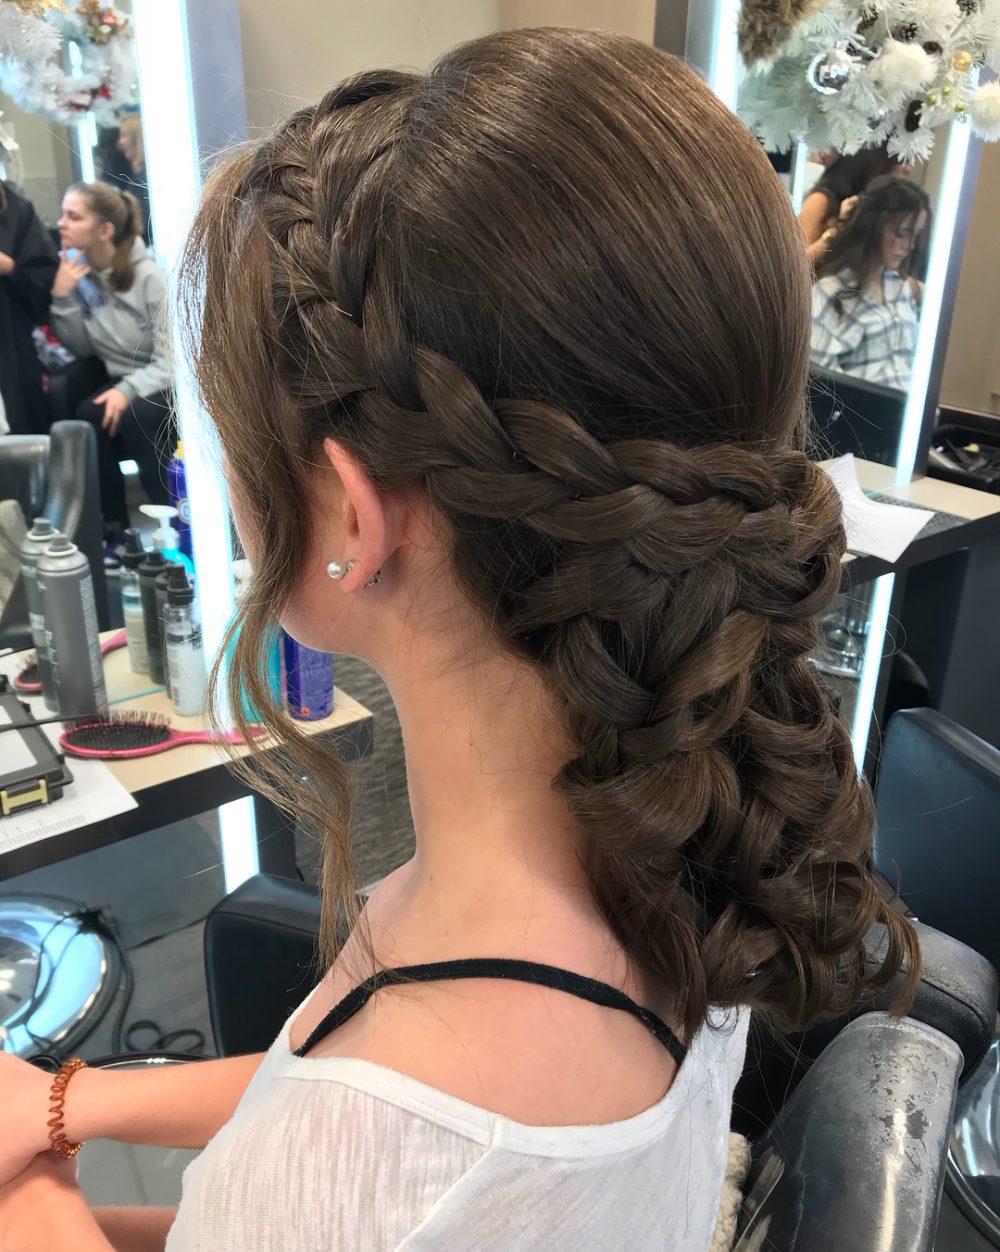 Romantic Braid hairstyle